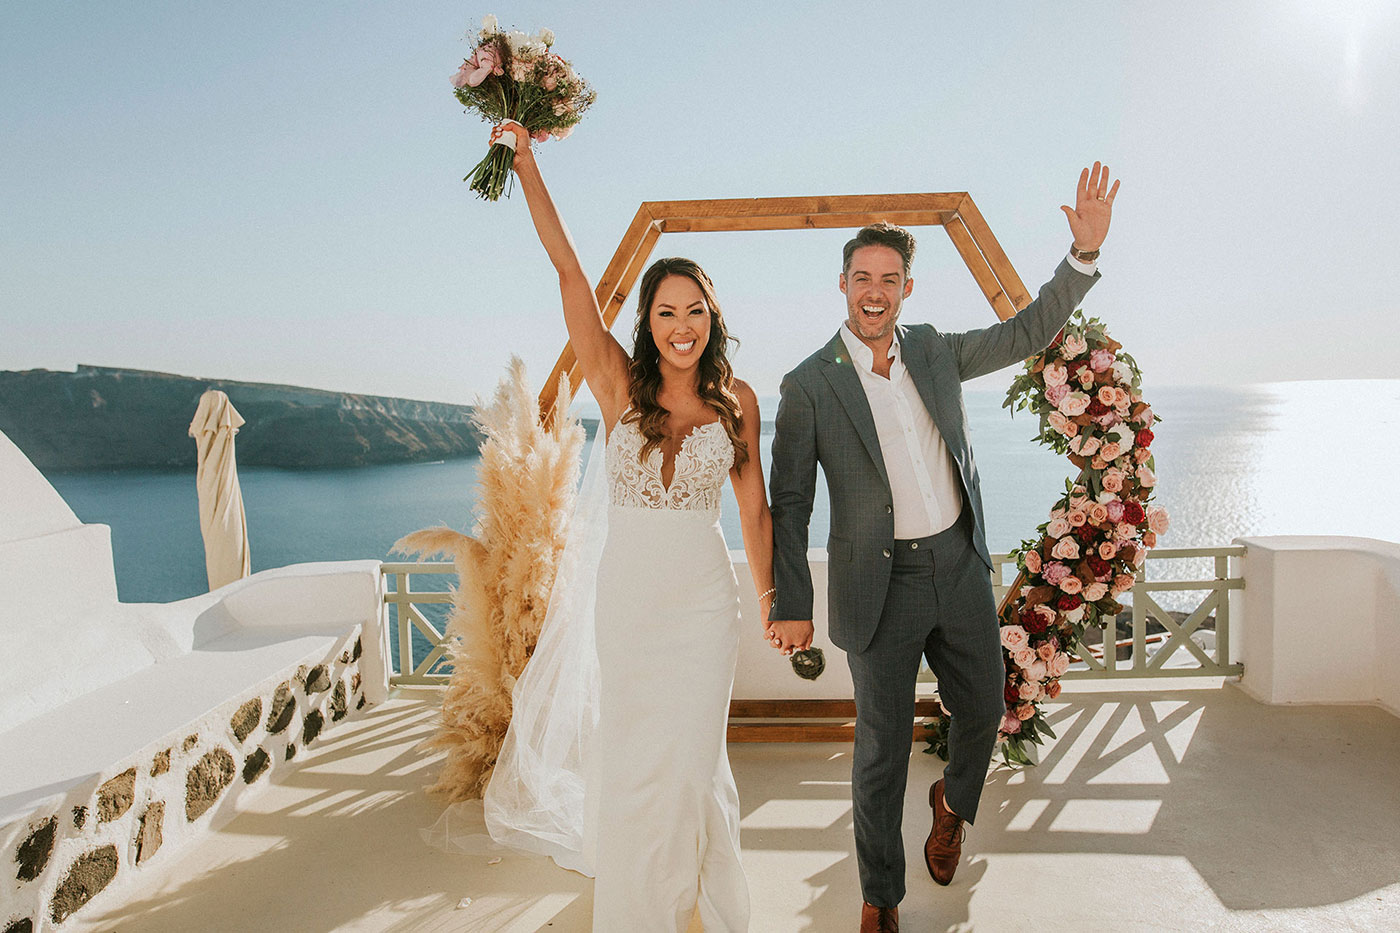 Chyna & Brandon's Scenic Santorini Wedding